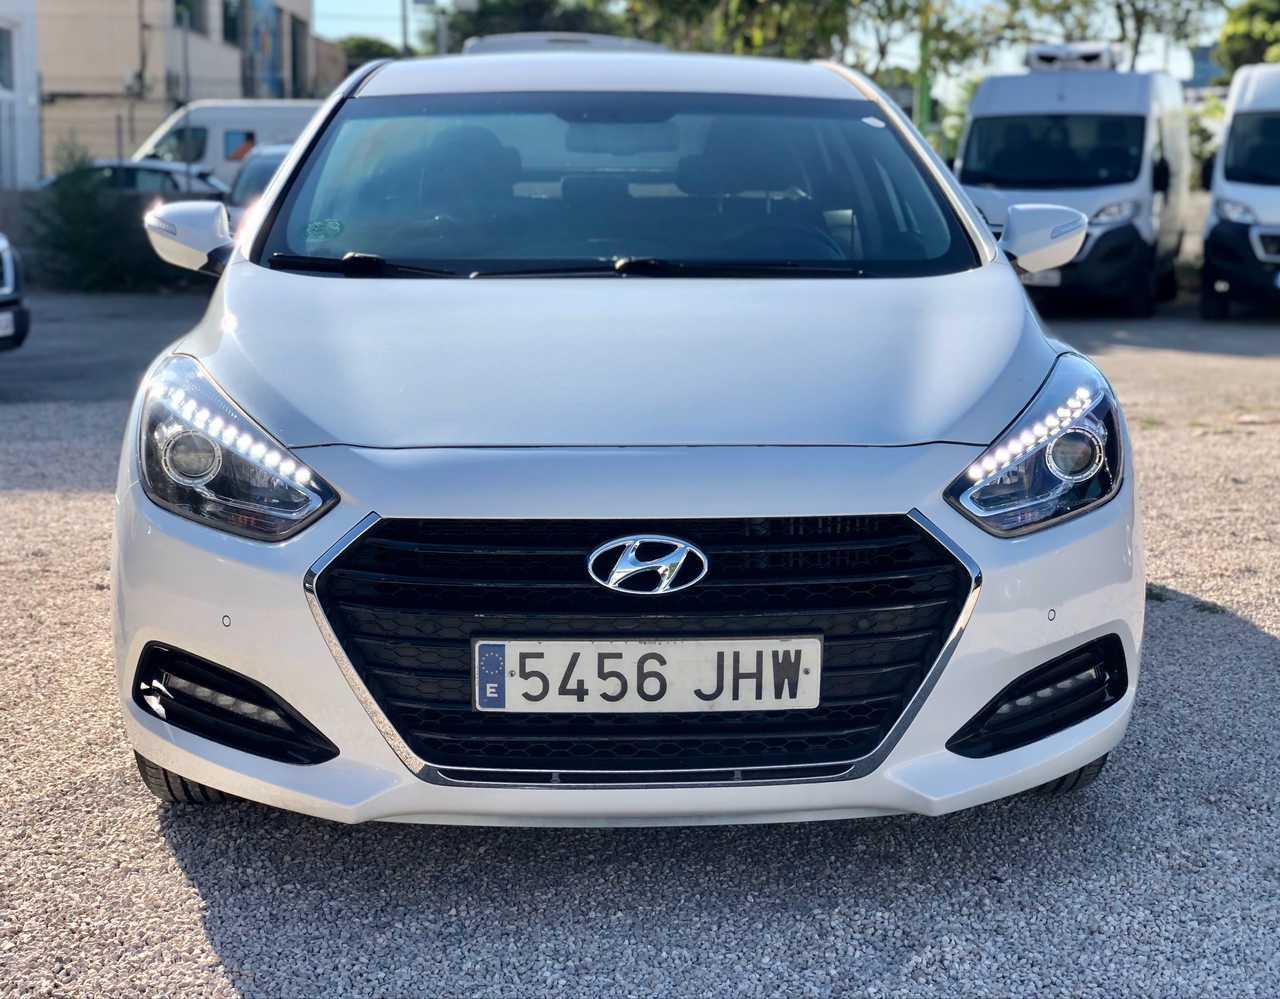 Hyundai i40 1.7CRDI 115 CV BLUEDRIVE KLASS   - Foto 1